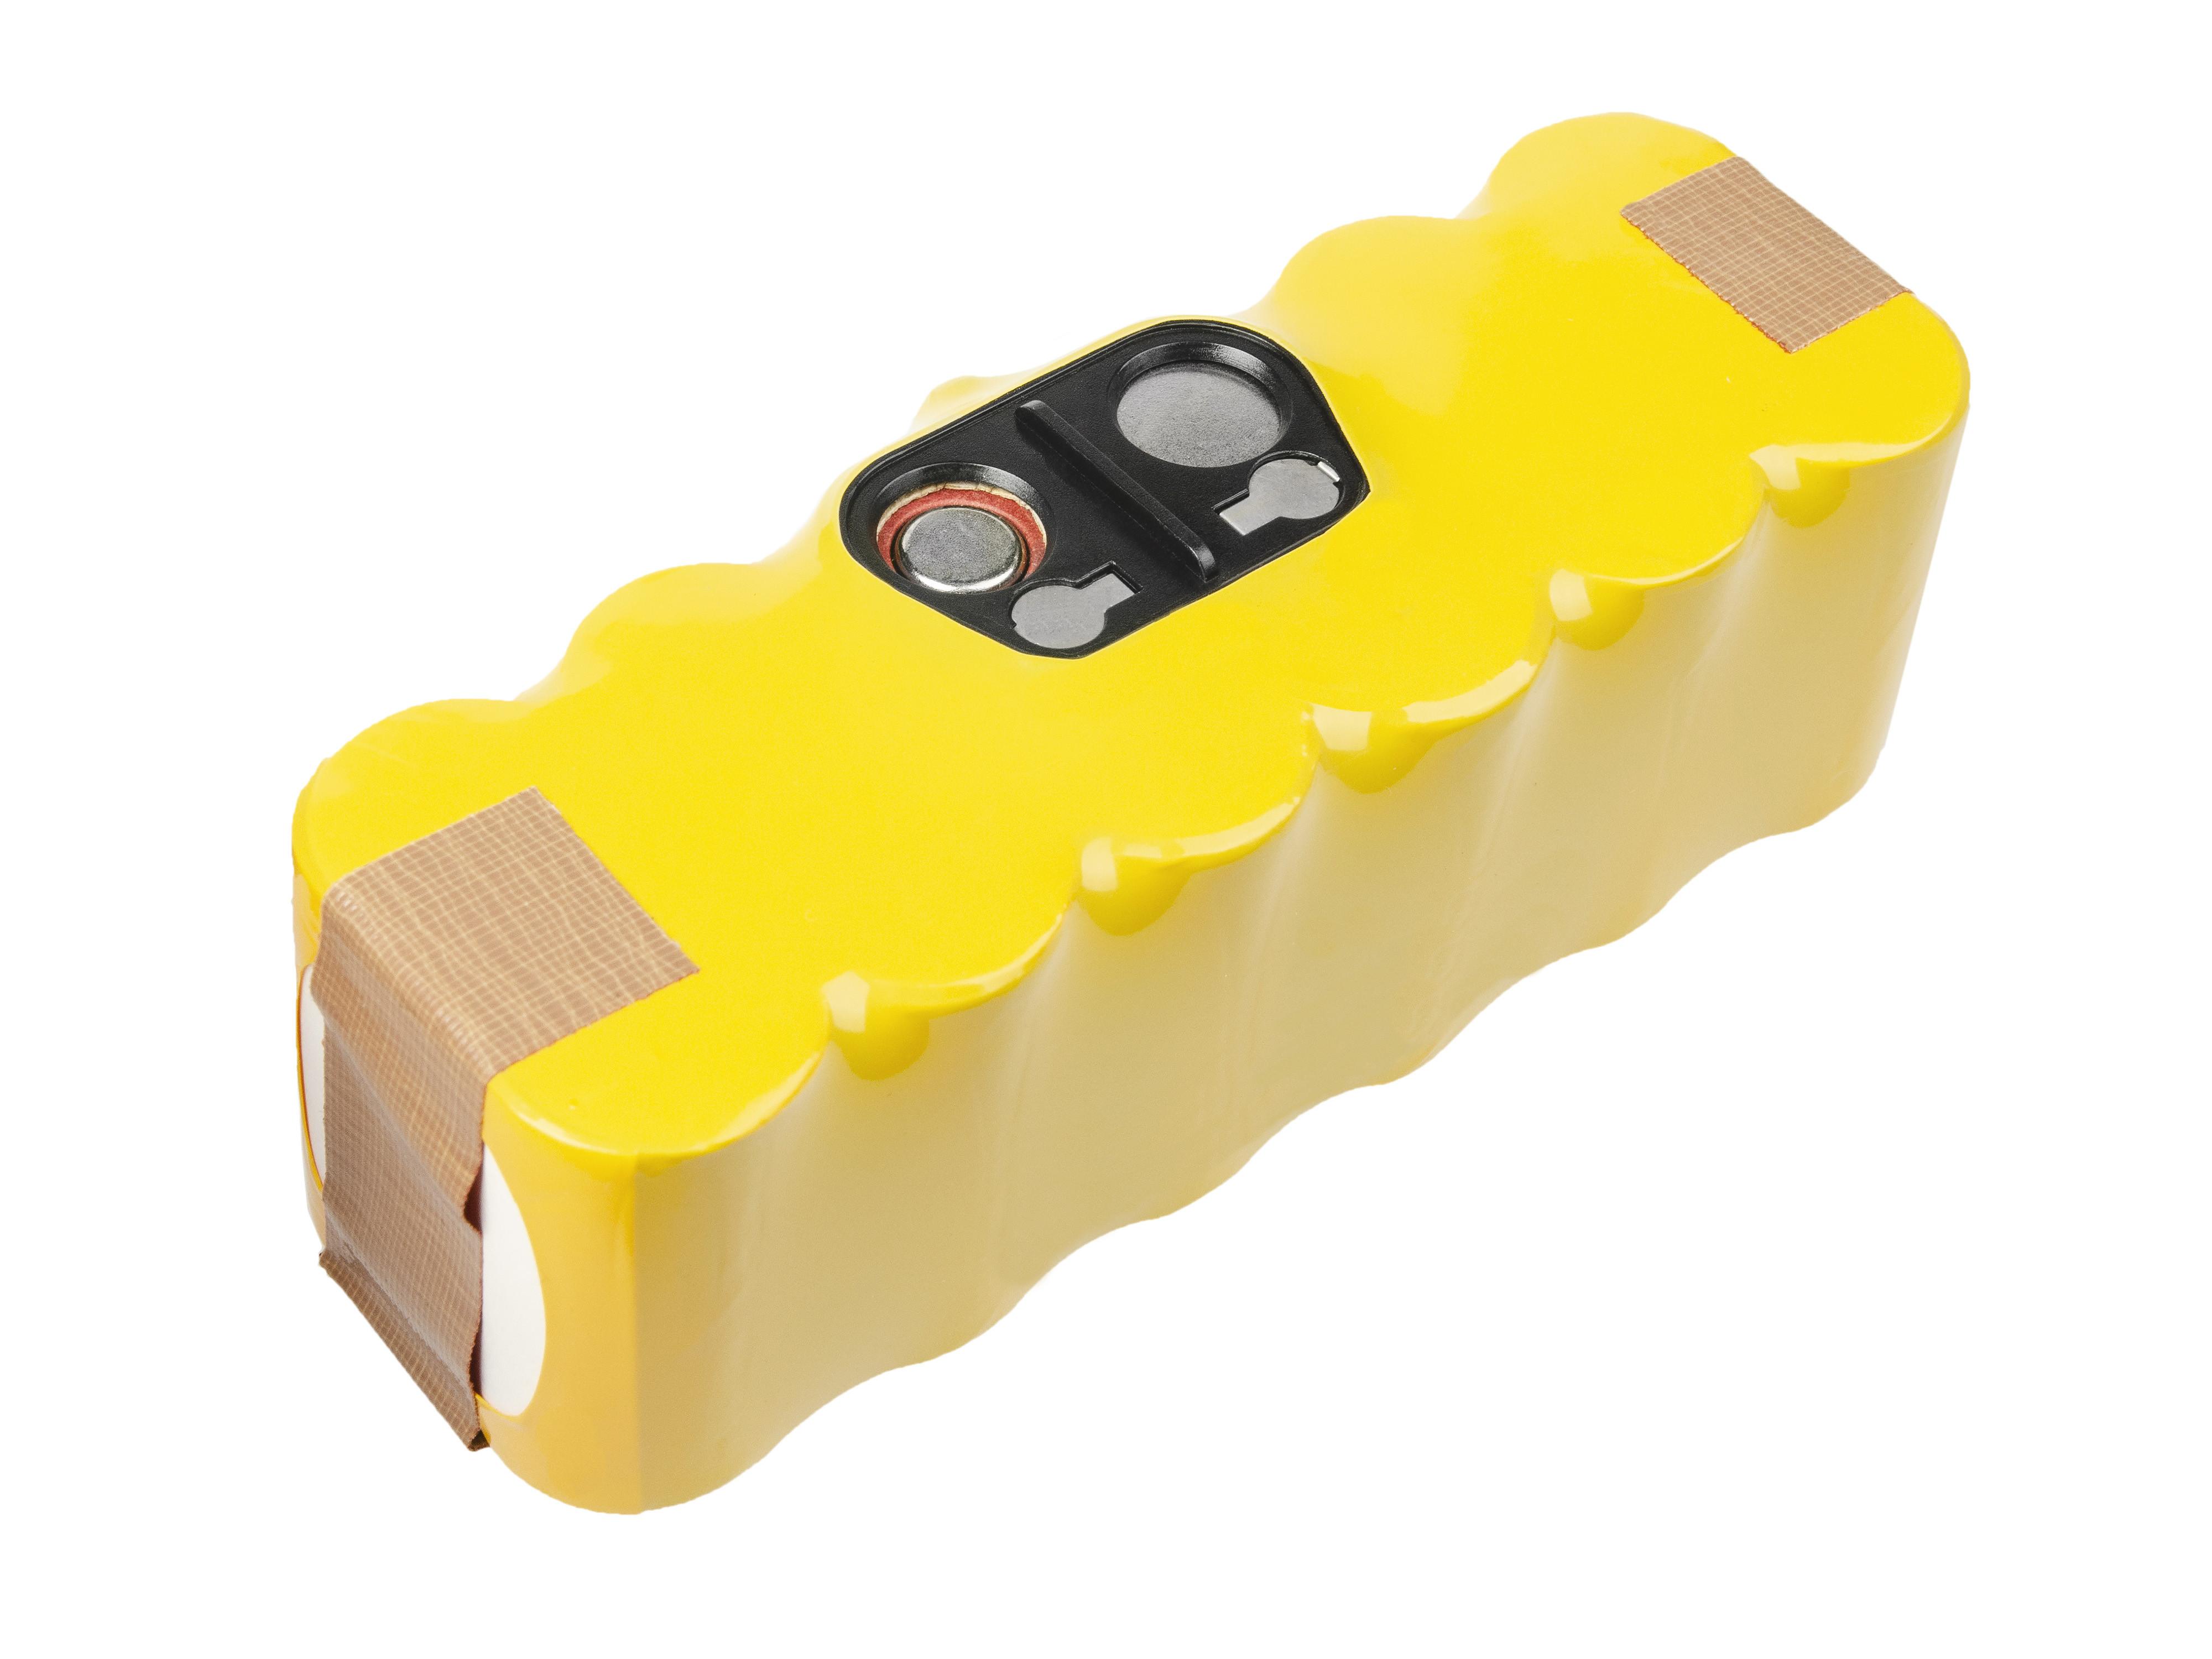 Baterie Green Cell iRobot Roomba 80501 510 530 540 550 560 570 580 610 620 625 760 770 780 14.4V 3500mAh Ni-MH – neoriginální